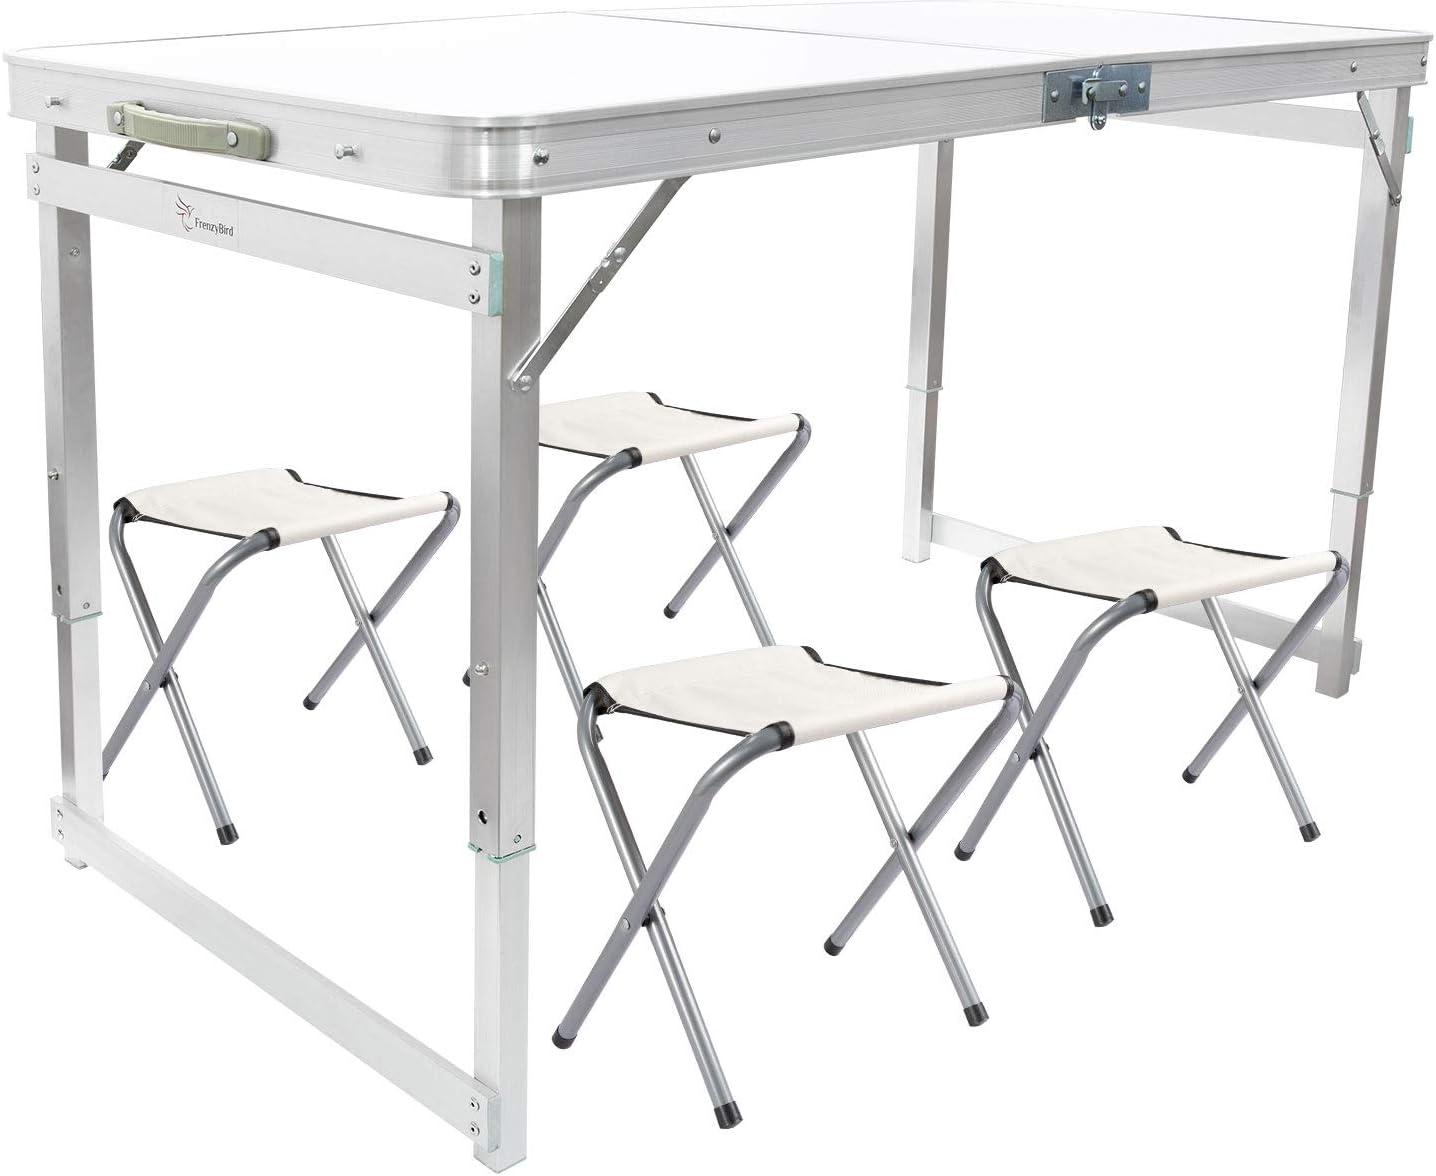 FrenzyBird Mesa de picnic plegable con 4 taburetes, mesa de aluminio Oxford Mat silla Set para hasta 4 personas, portátil ligero y altura ajustable ...